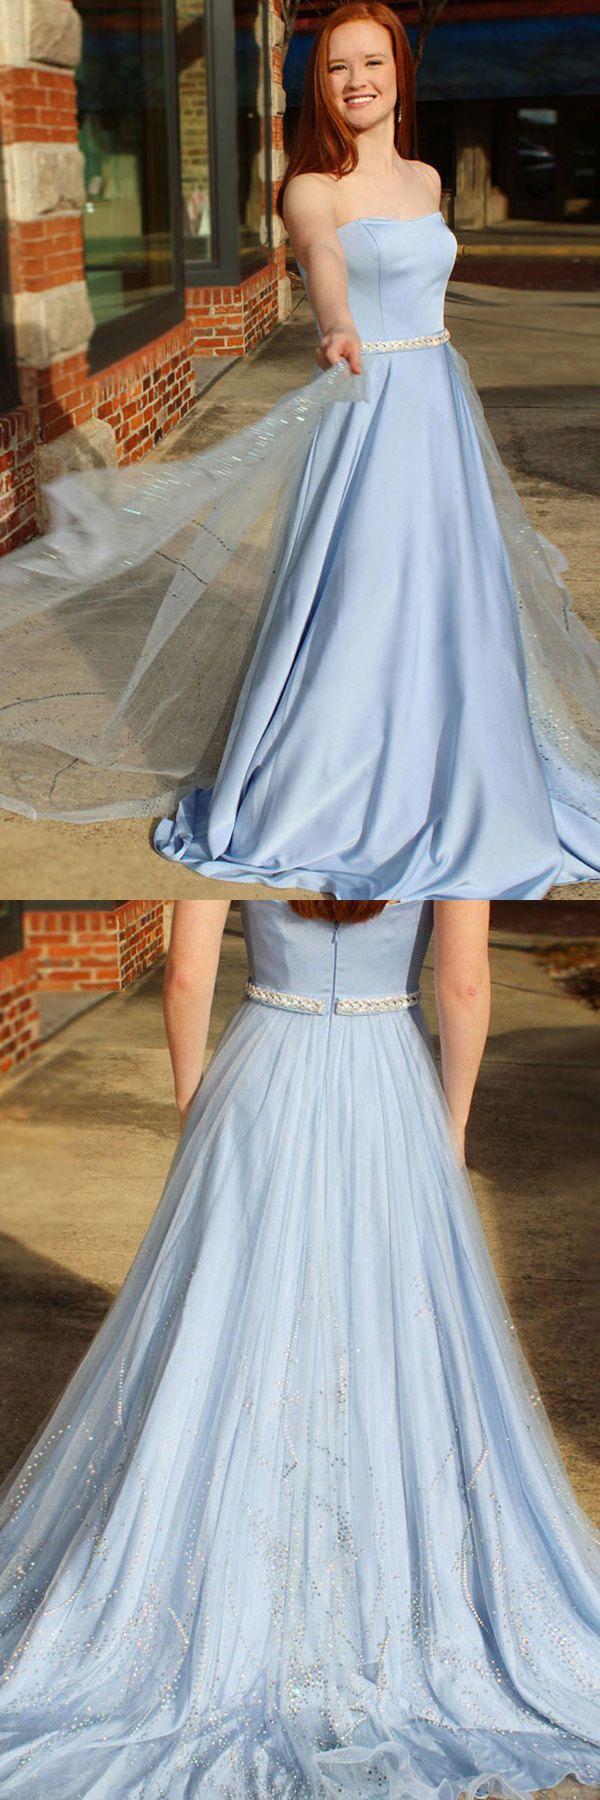 Newest Long Sky Blue Strapless Elegant Prom Dresses Cute Dresses Us 185 00 Stp8p9rjp1 Stylishpromsdress Co Uk Cute Dresses Prom Dresses Sleeveless Prom Dresses For Teens [ 1800 x 600 Pixel ]